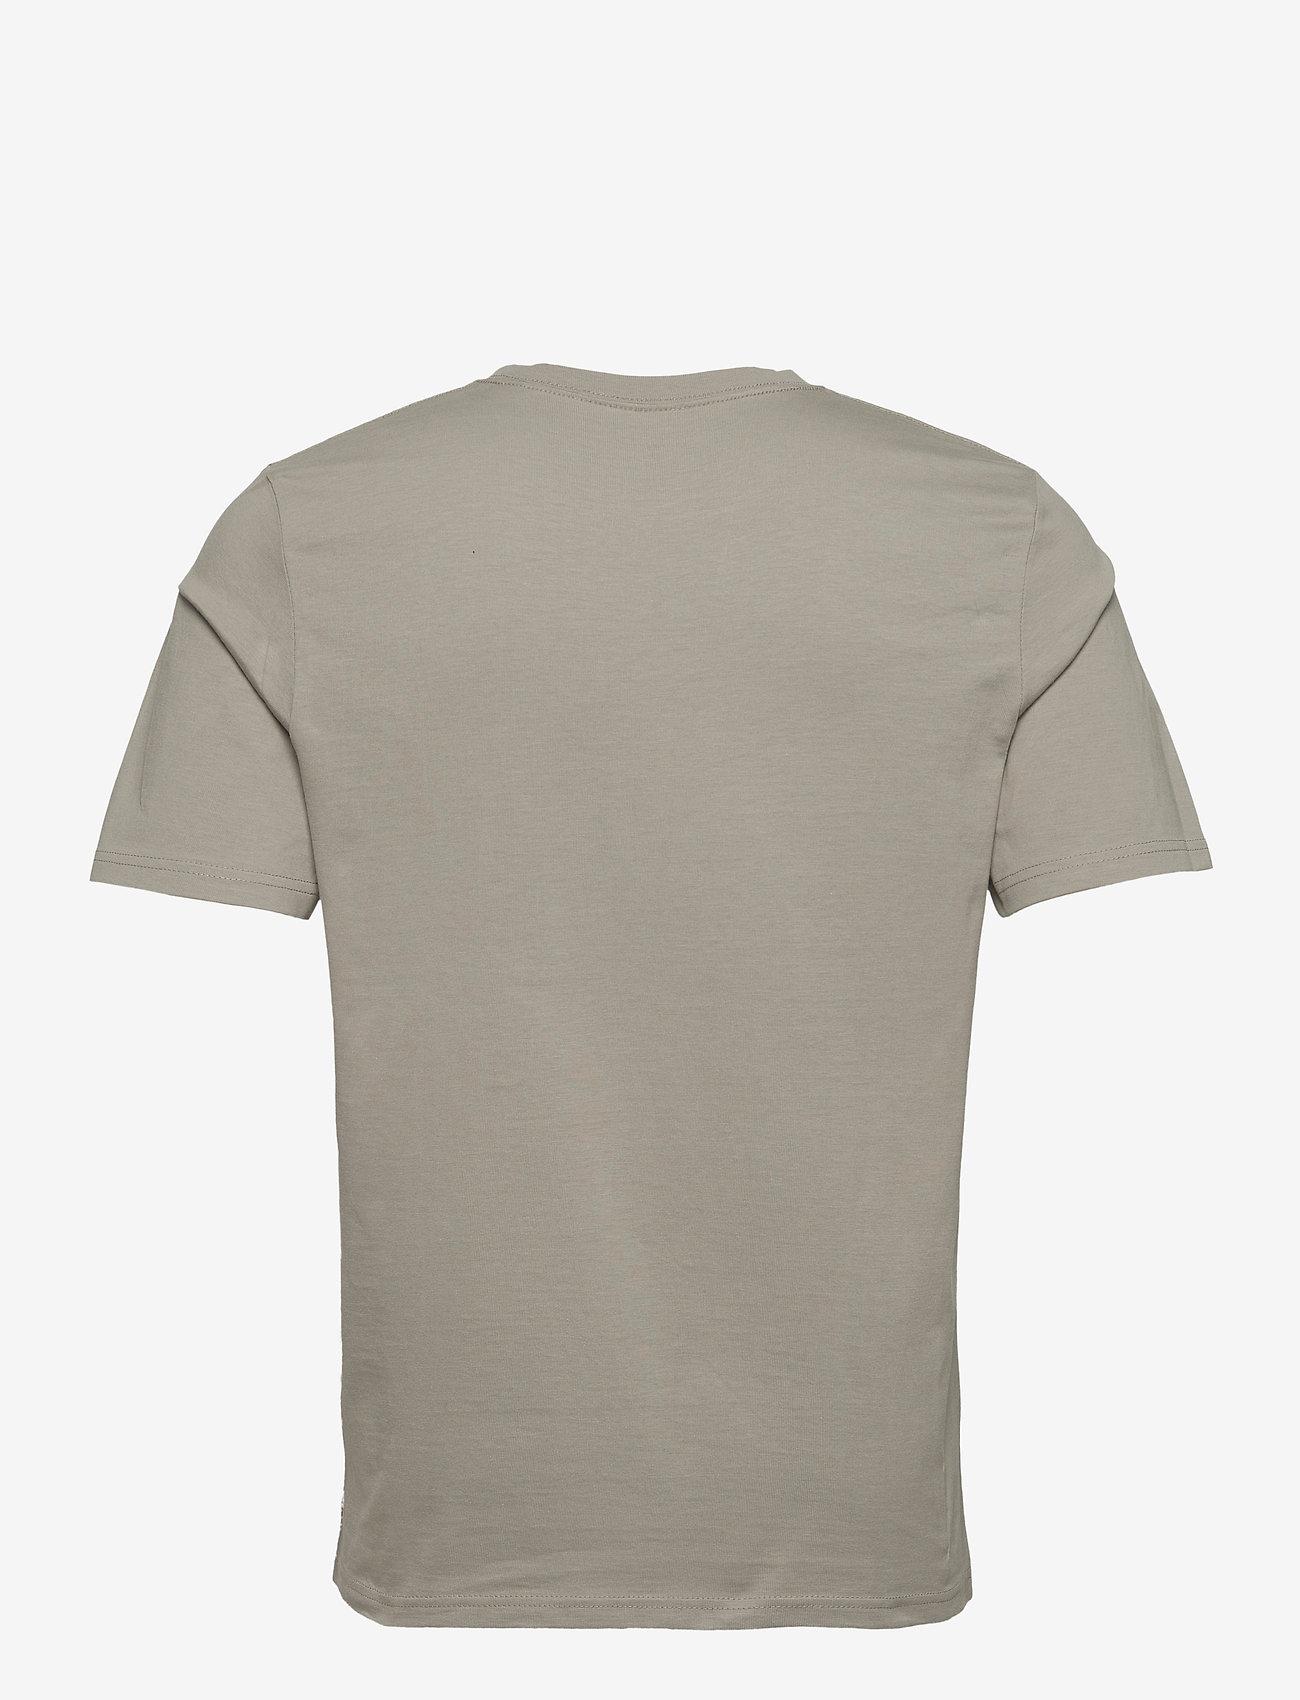 Jack & Jones - JPRBLAWAYN TEE SS CREW NECK - basic t-shirts - elephant skin - 1